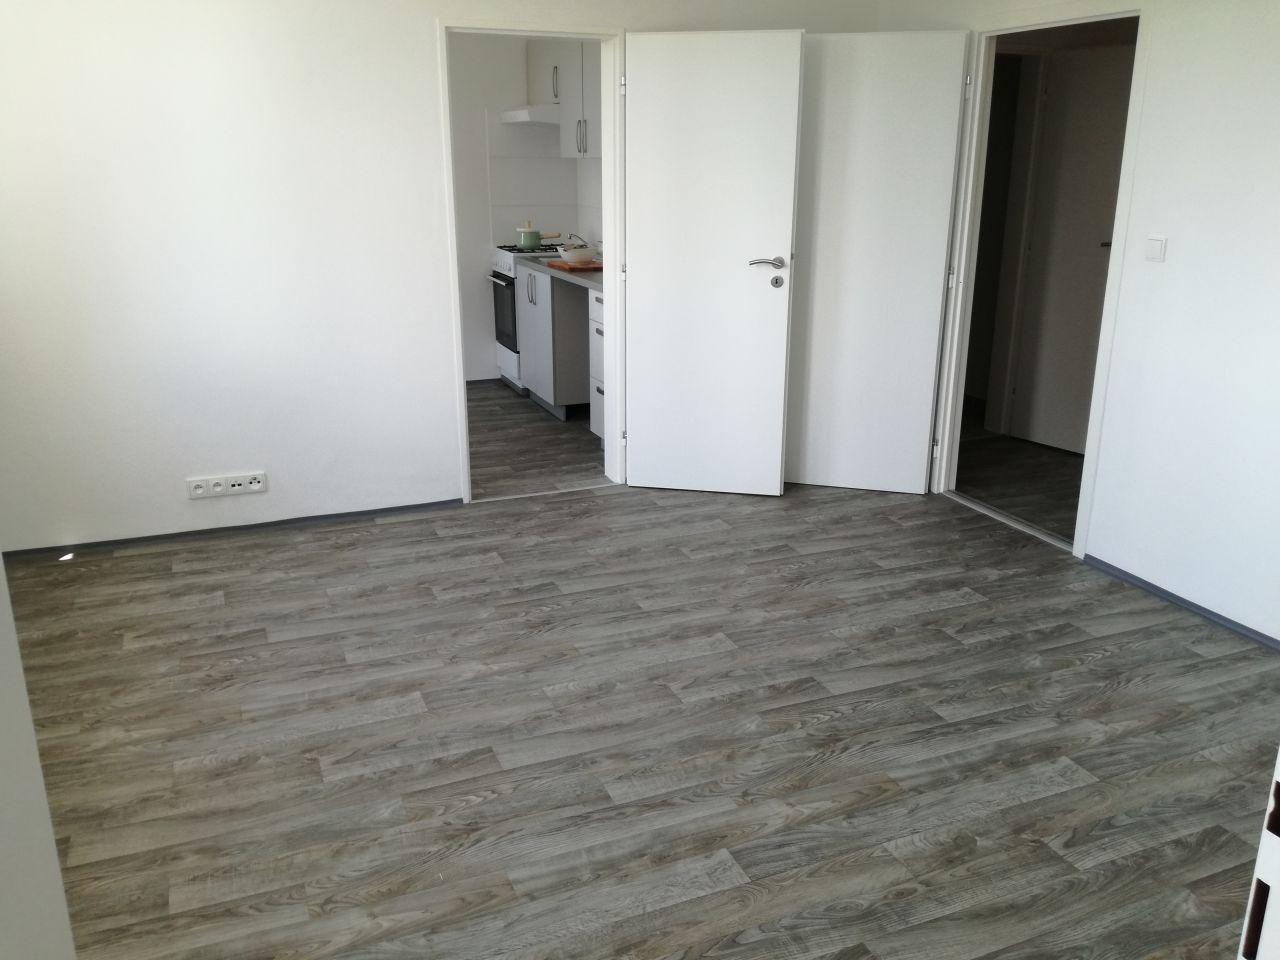 Pronájem bytu 2+1 44 m2, ul. Václava Košaře 61/30, Ostrava Dubina